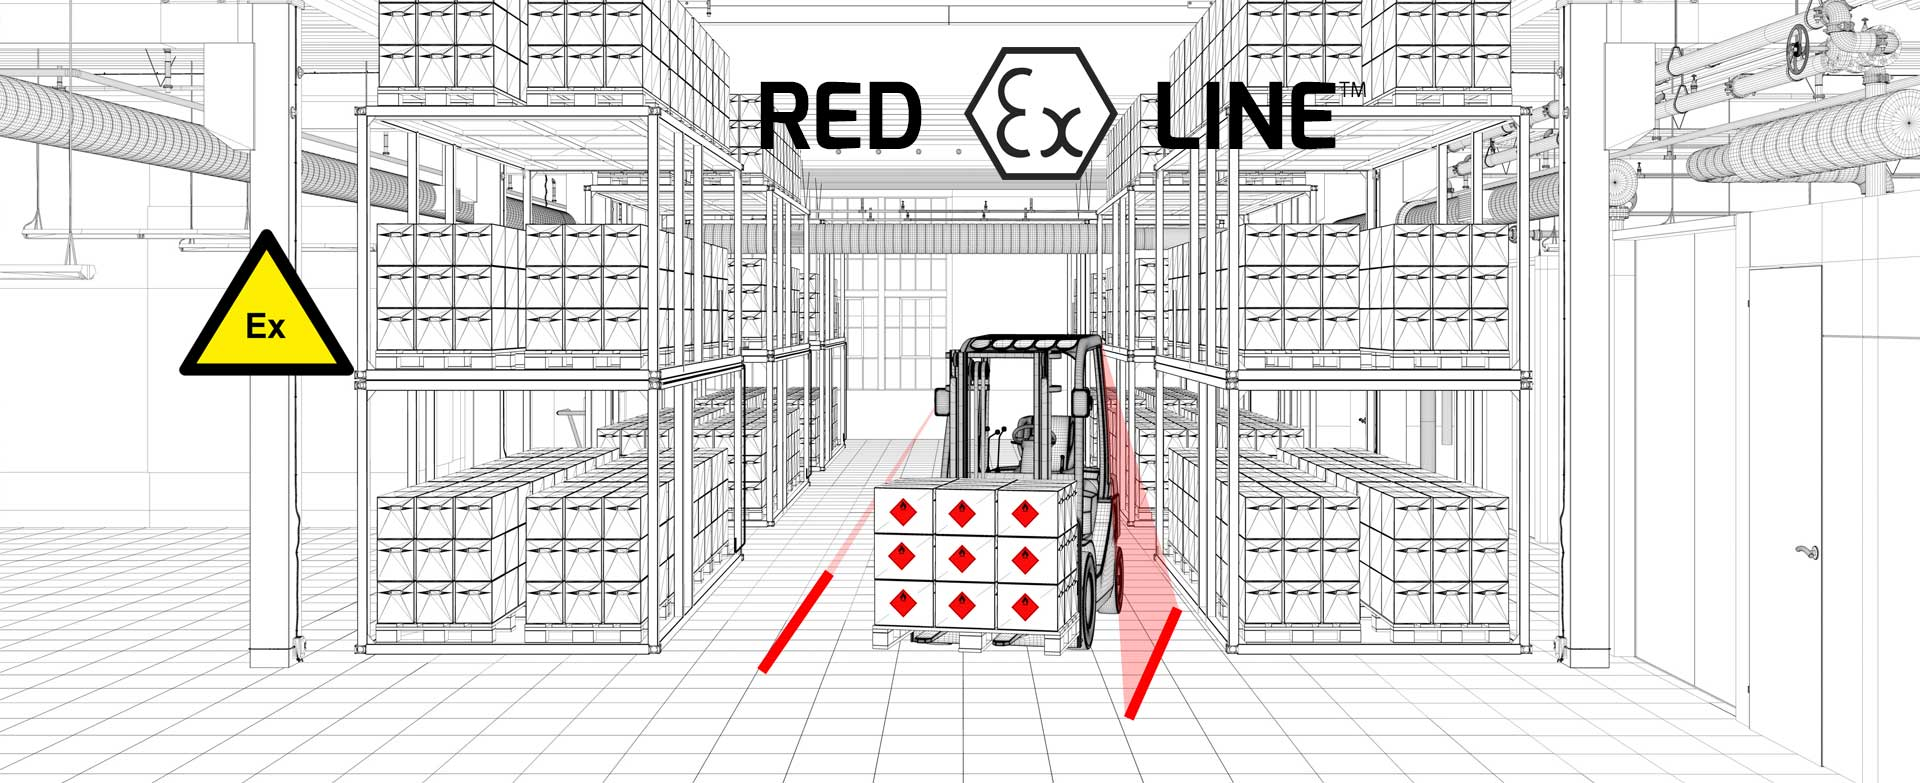 Red Ex Line - red perimeter warning light